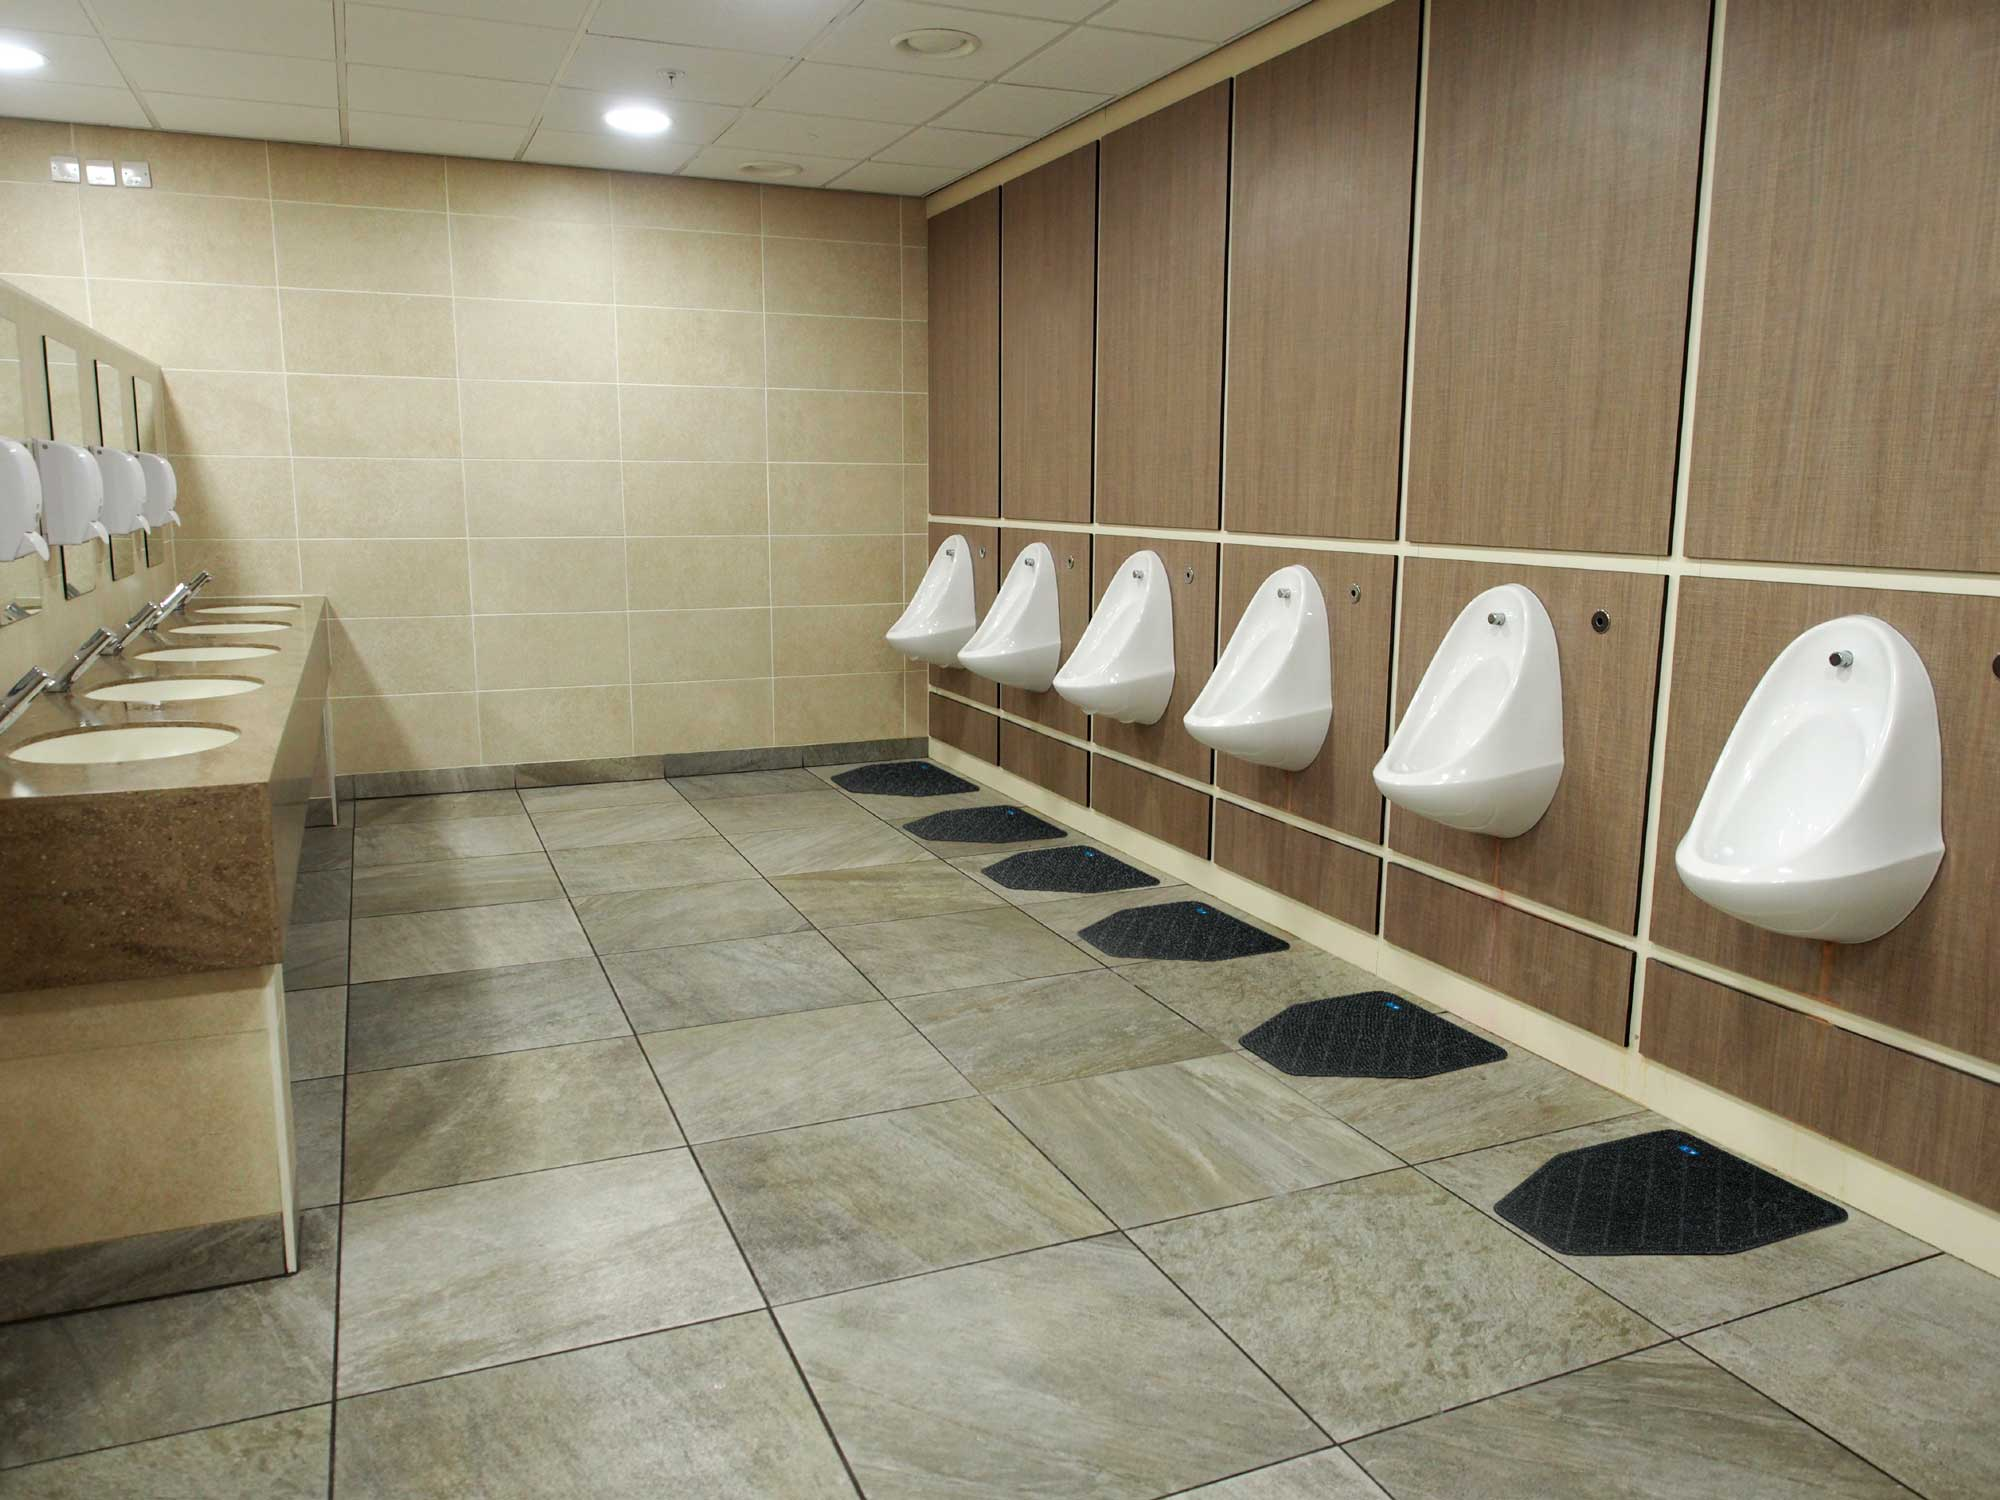 Cleanshield Urinal Mat Disposable Urinal Floor Mat